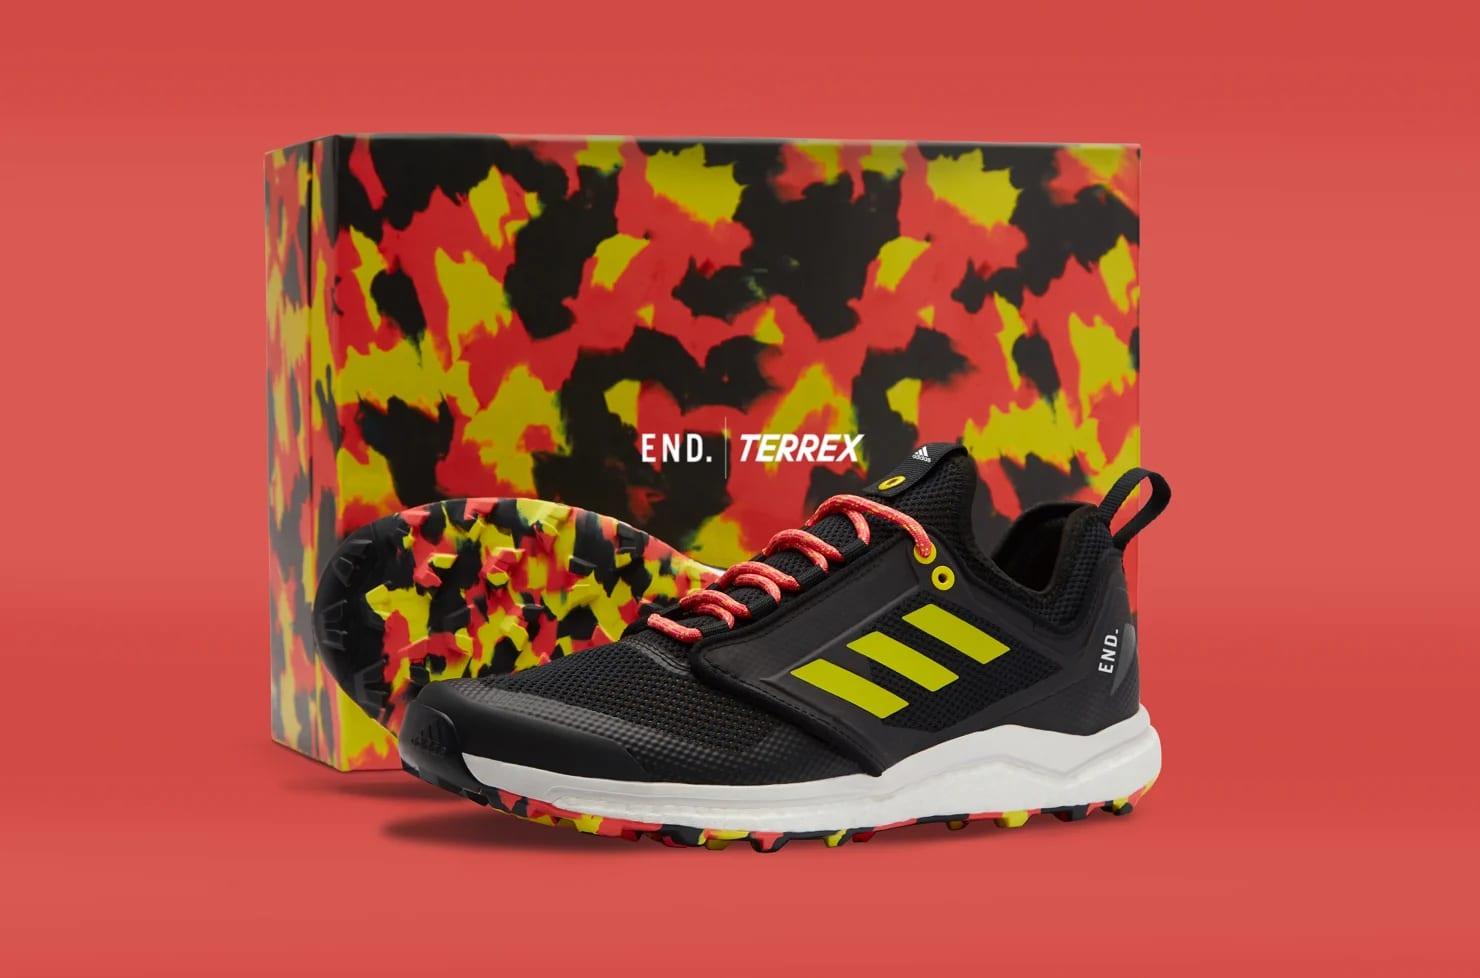 End. x Adidas Consortium Terrex Agravic XT 'Black/Red' F35785 1